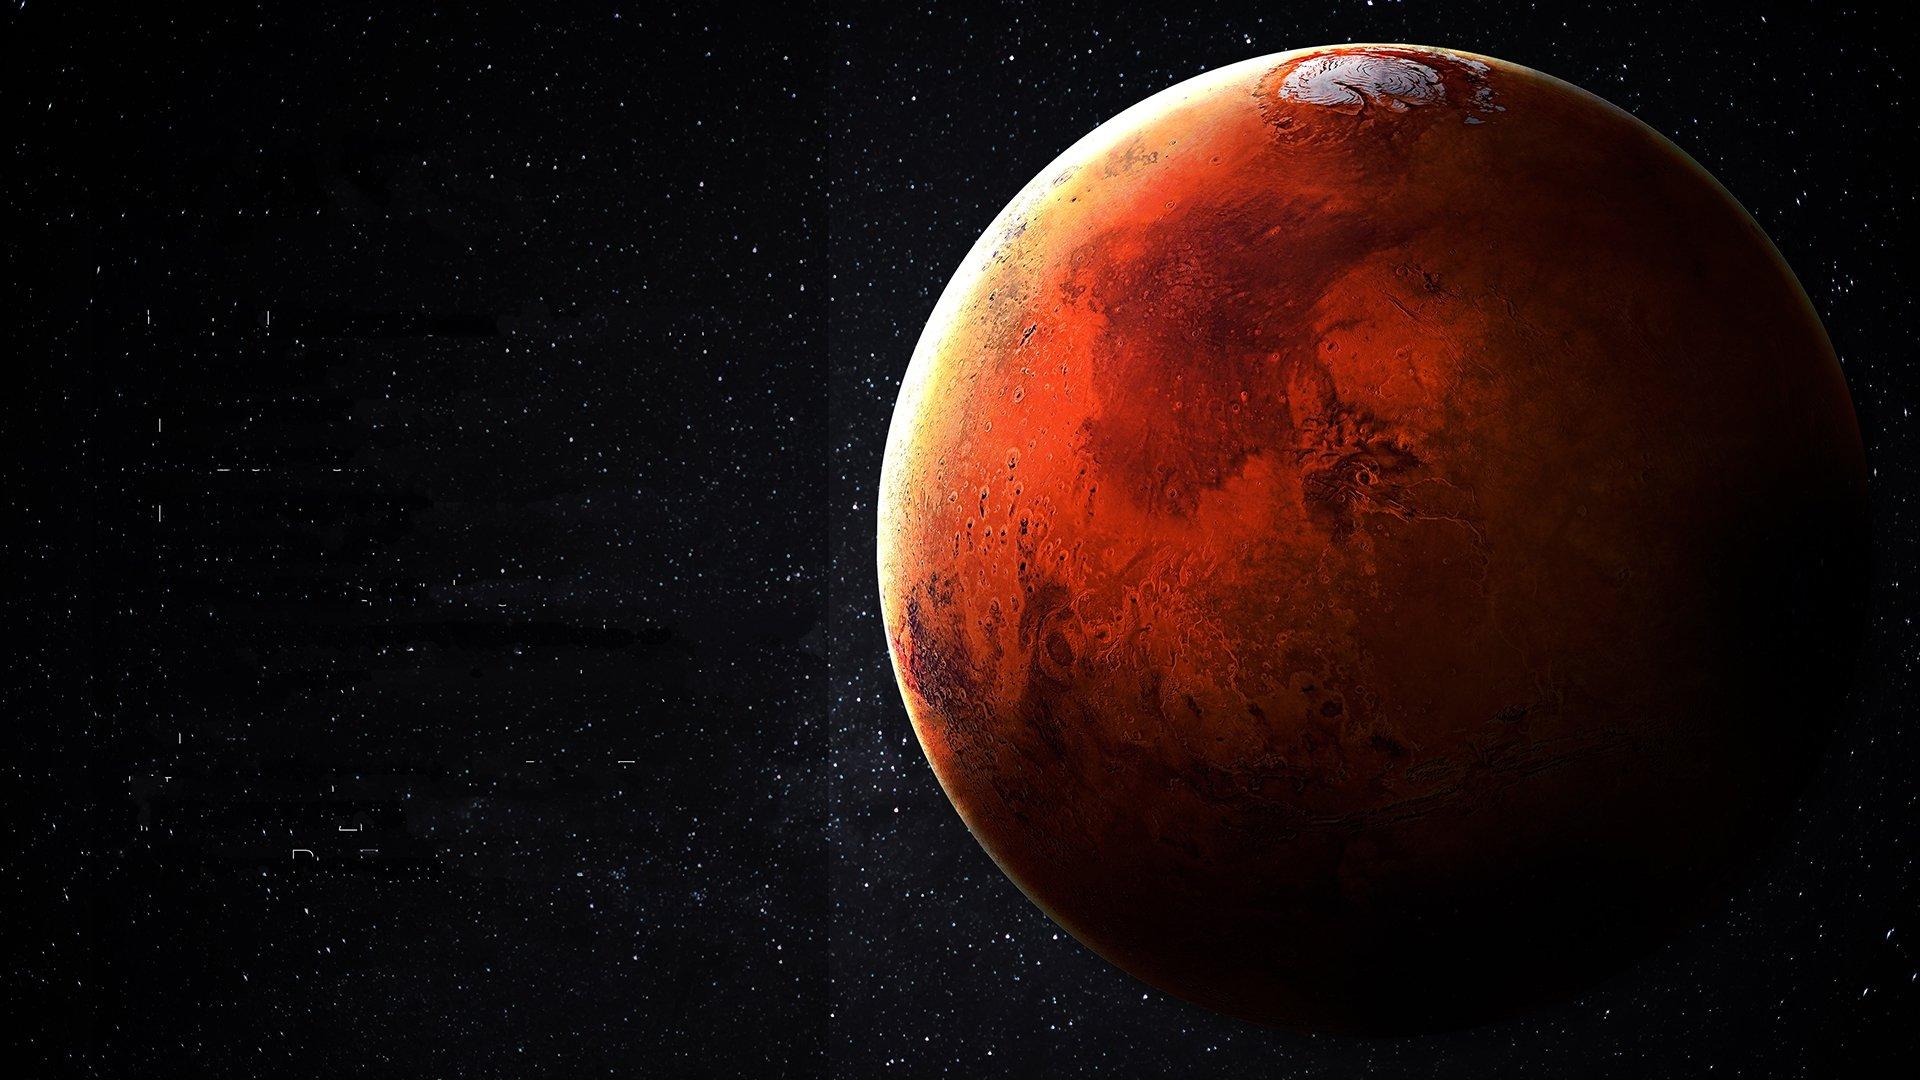 Mars Wallpaper Image